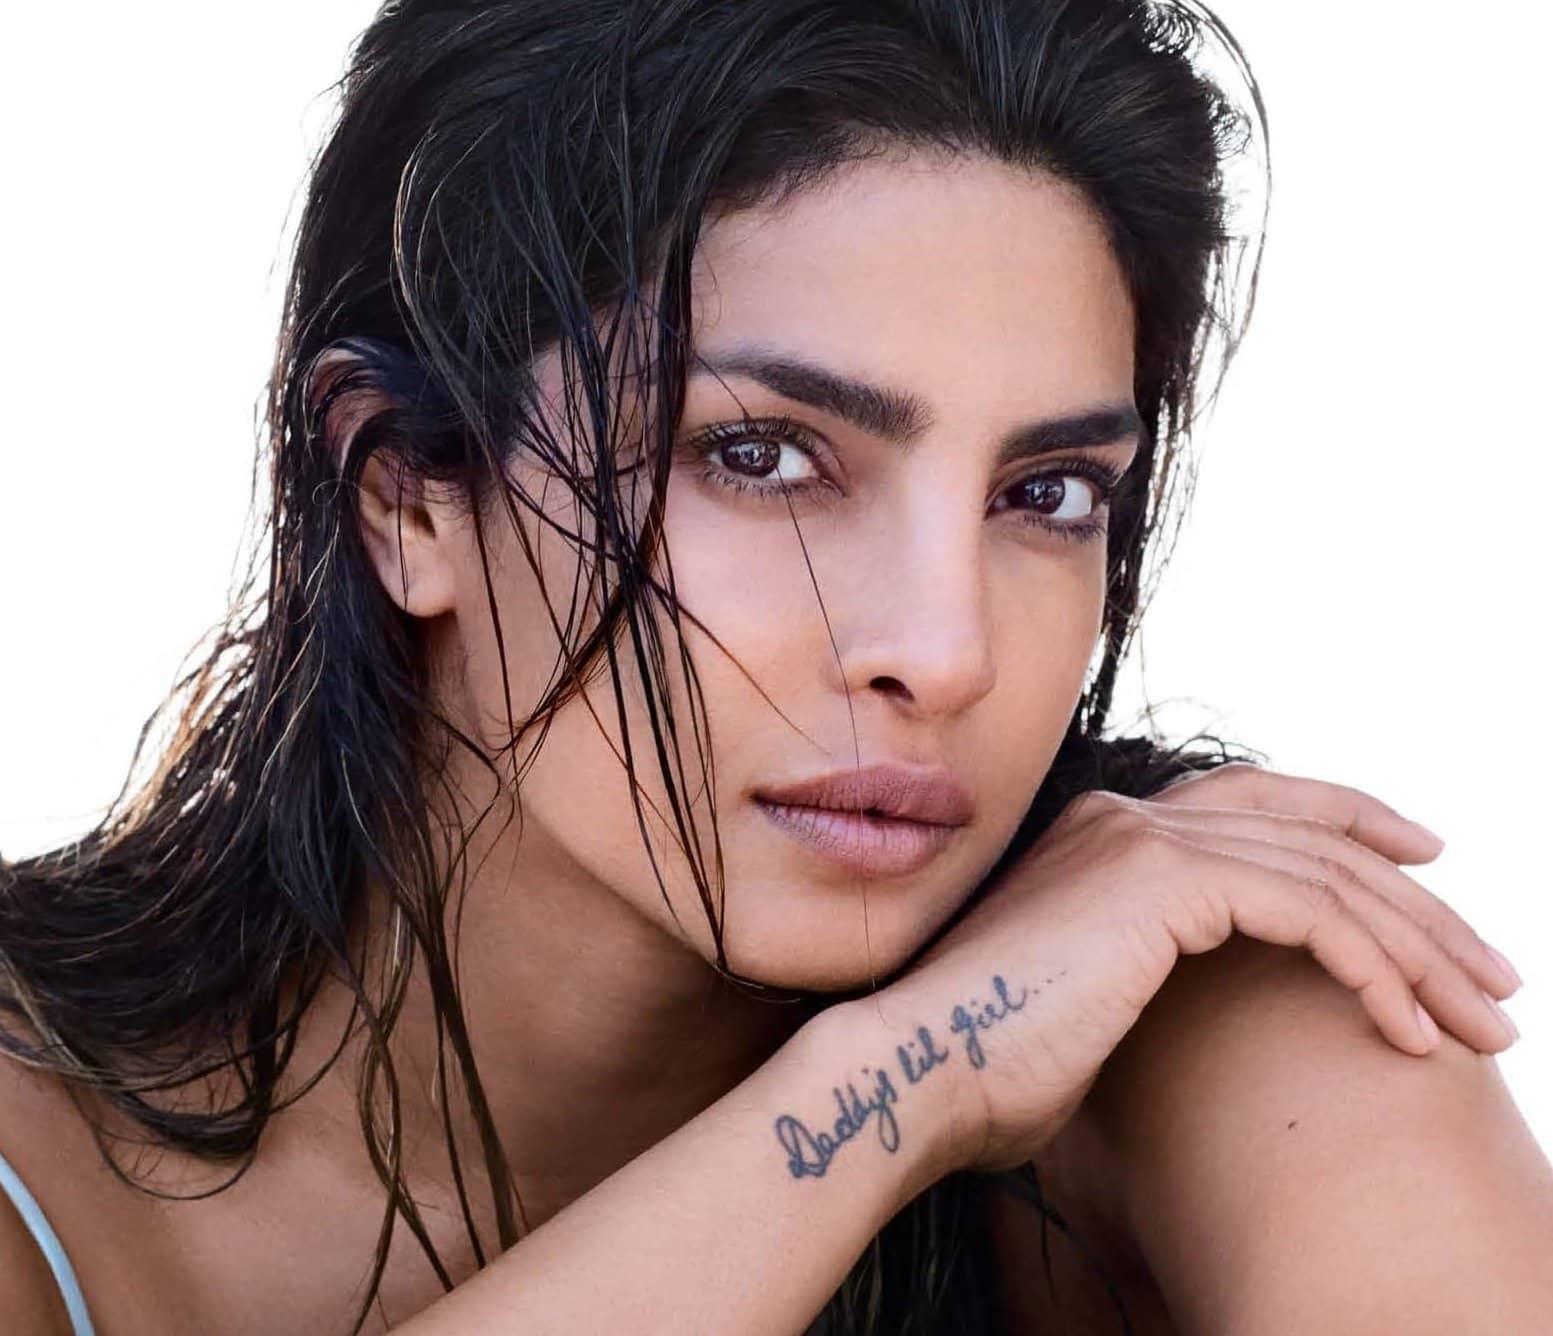 Priyanka Chopra Wants The World To Rethink How It Sees Beauty